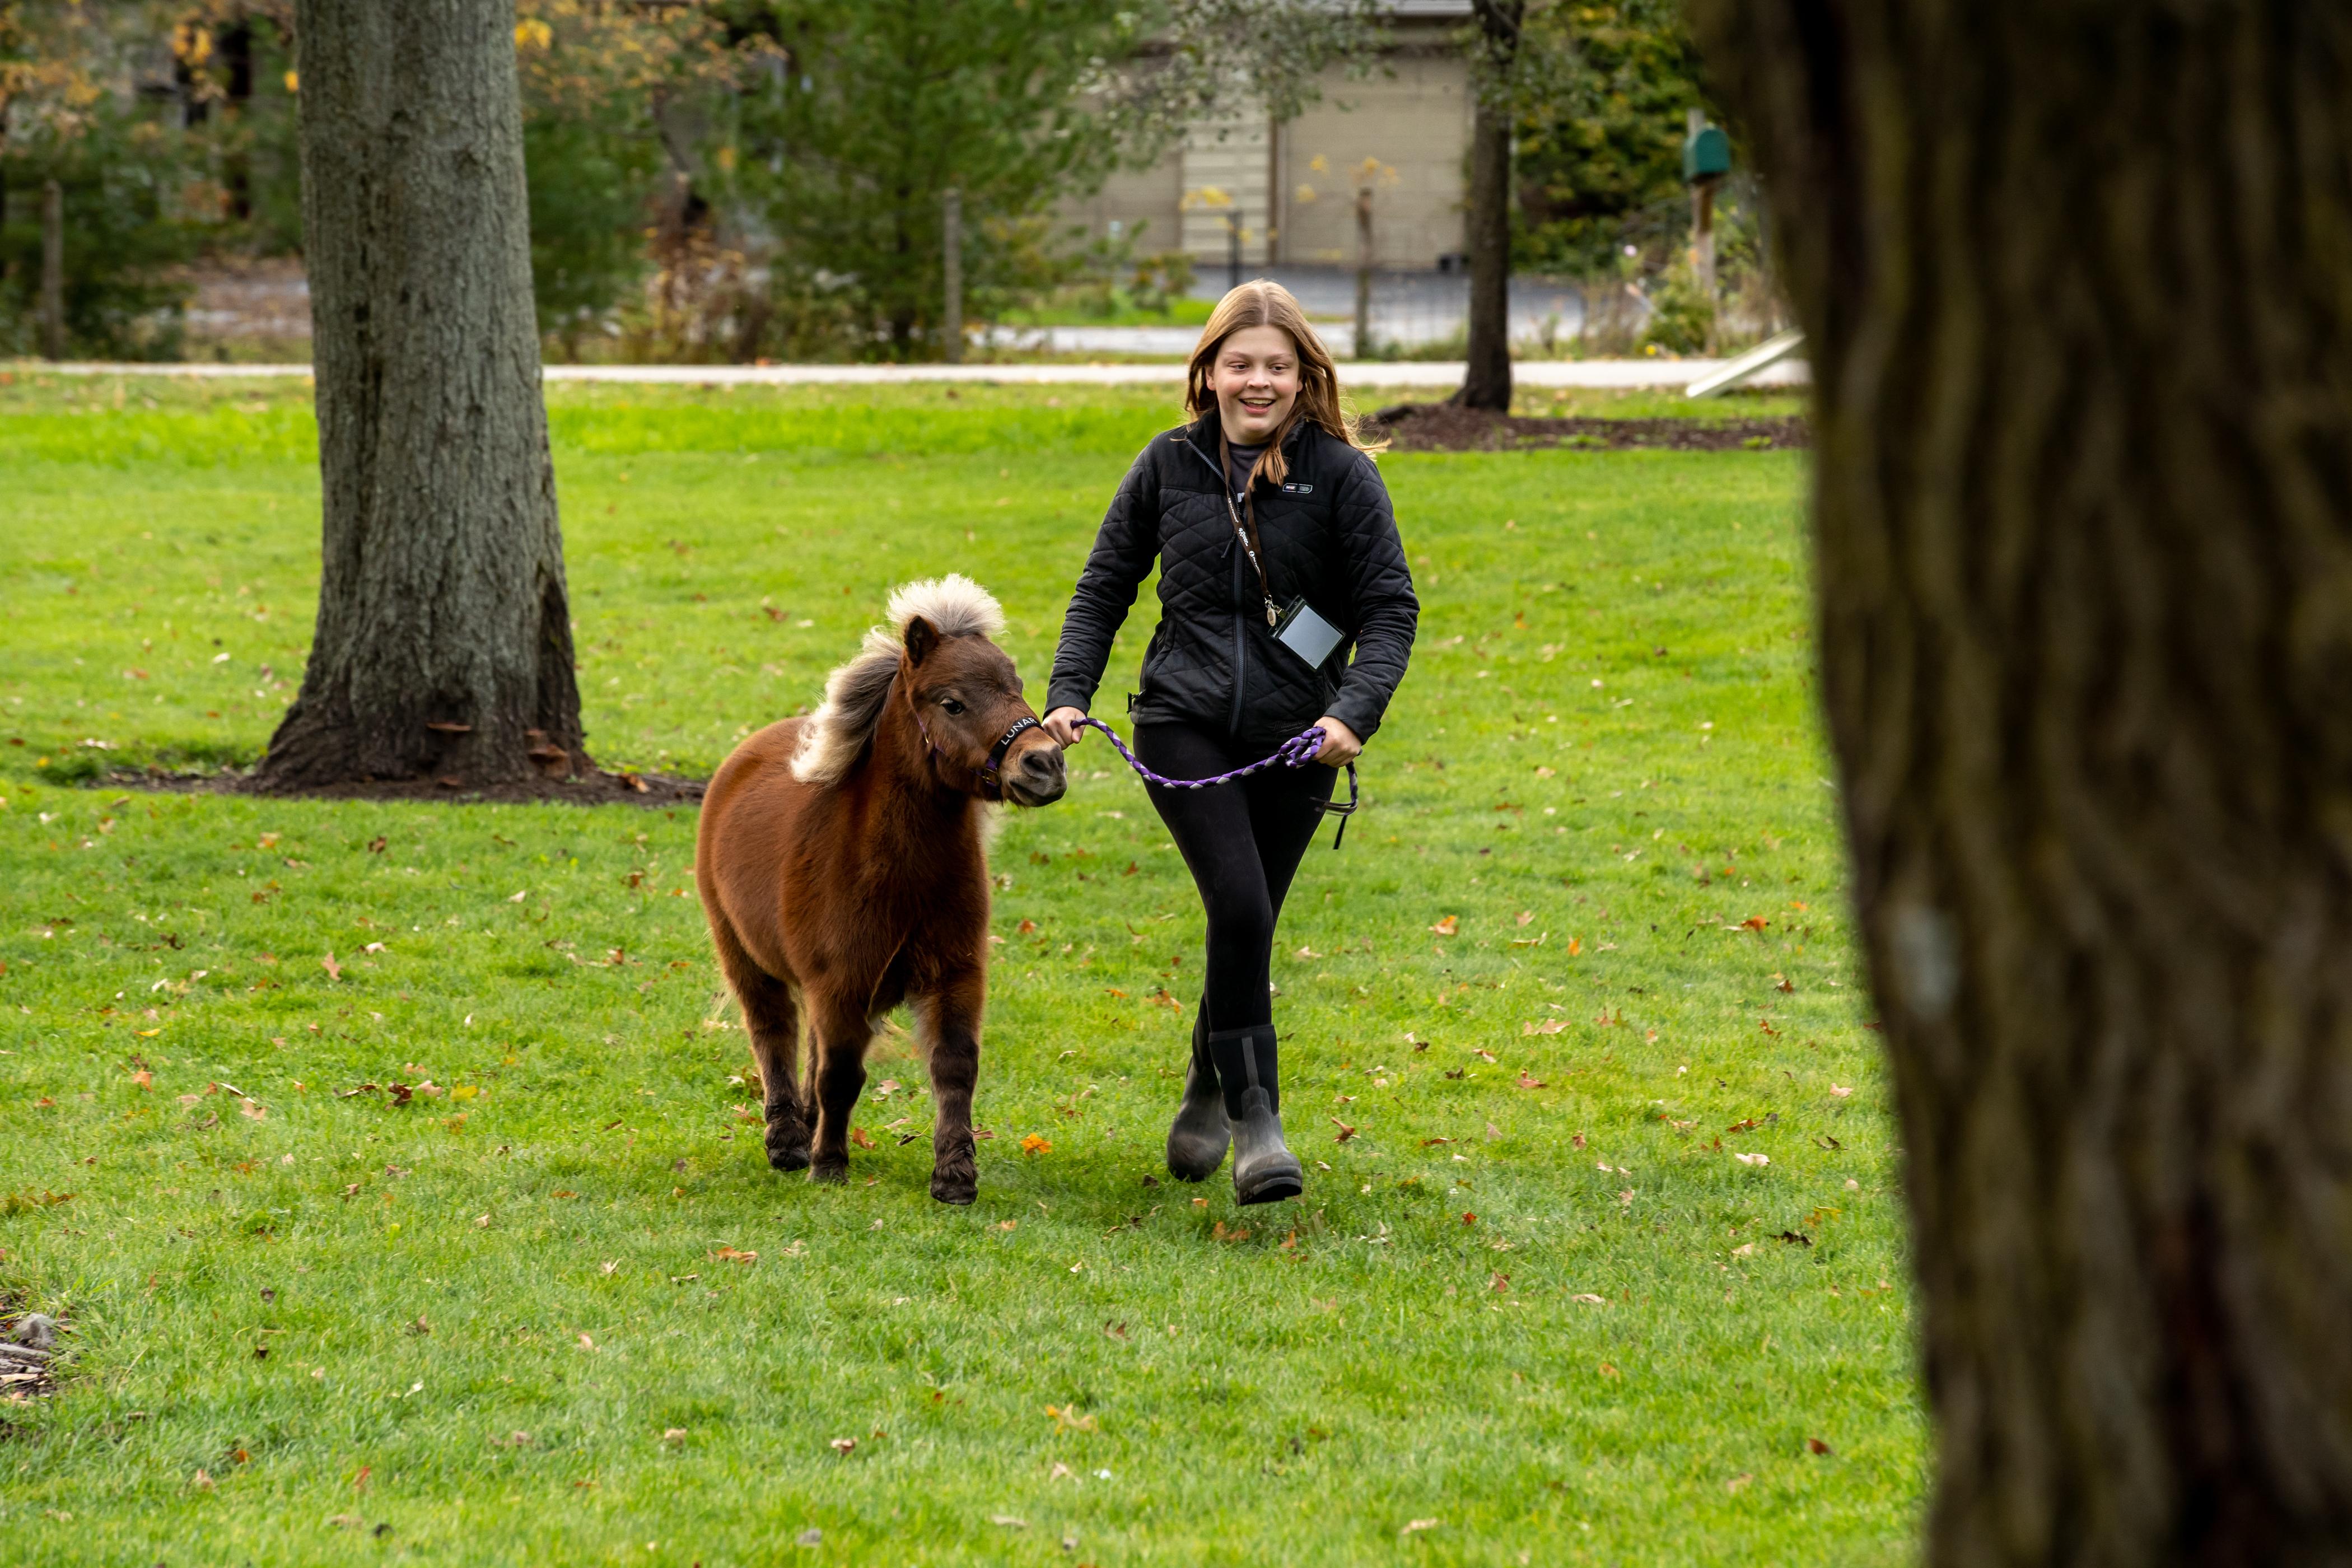 Alyssa Helenowski, 18, of Barrington, Ill., runs with Lunar, a silver bay miniature horse, at SOUL Harbour Ranch.